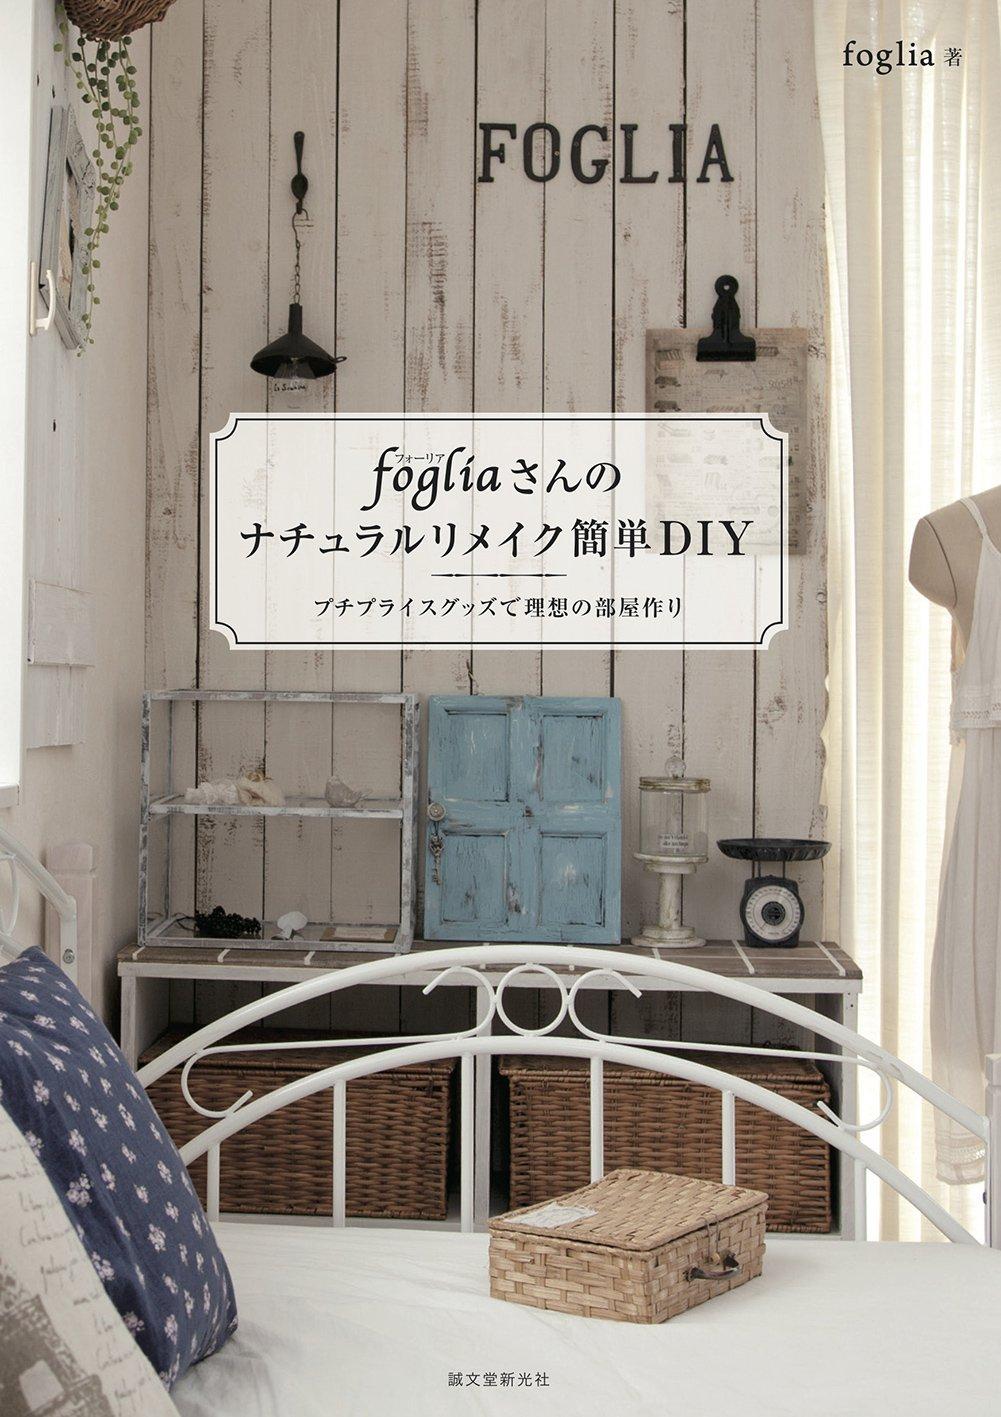 fogliaさんのナチュラルリメイク簡単DIY:プチプライスグッズで理想の部屋作り